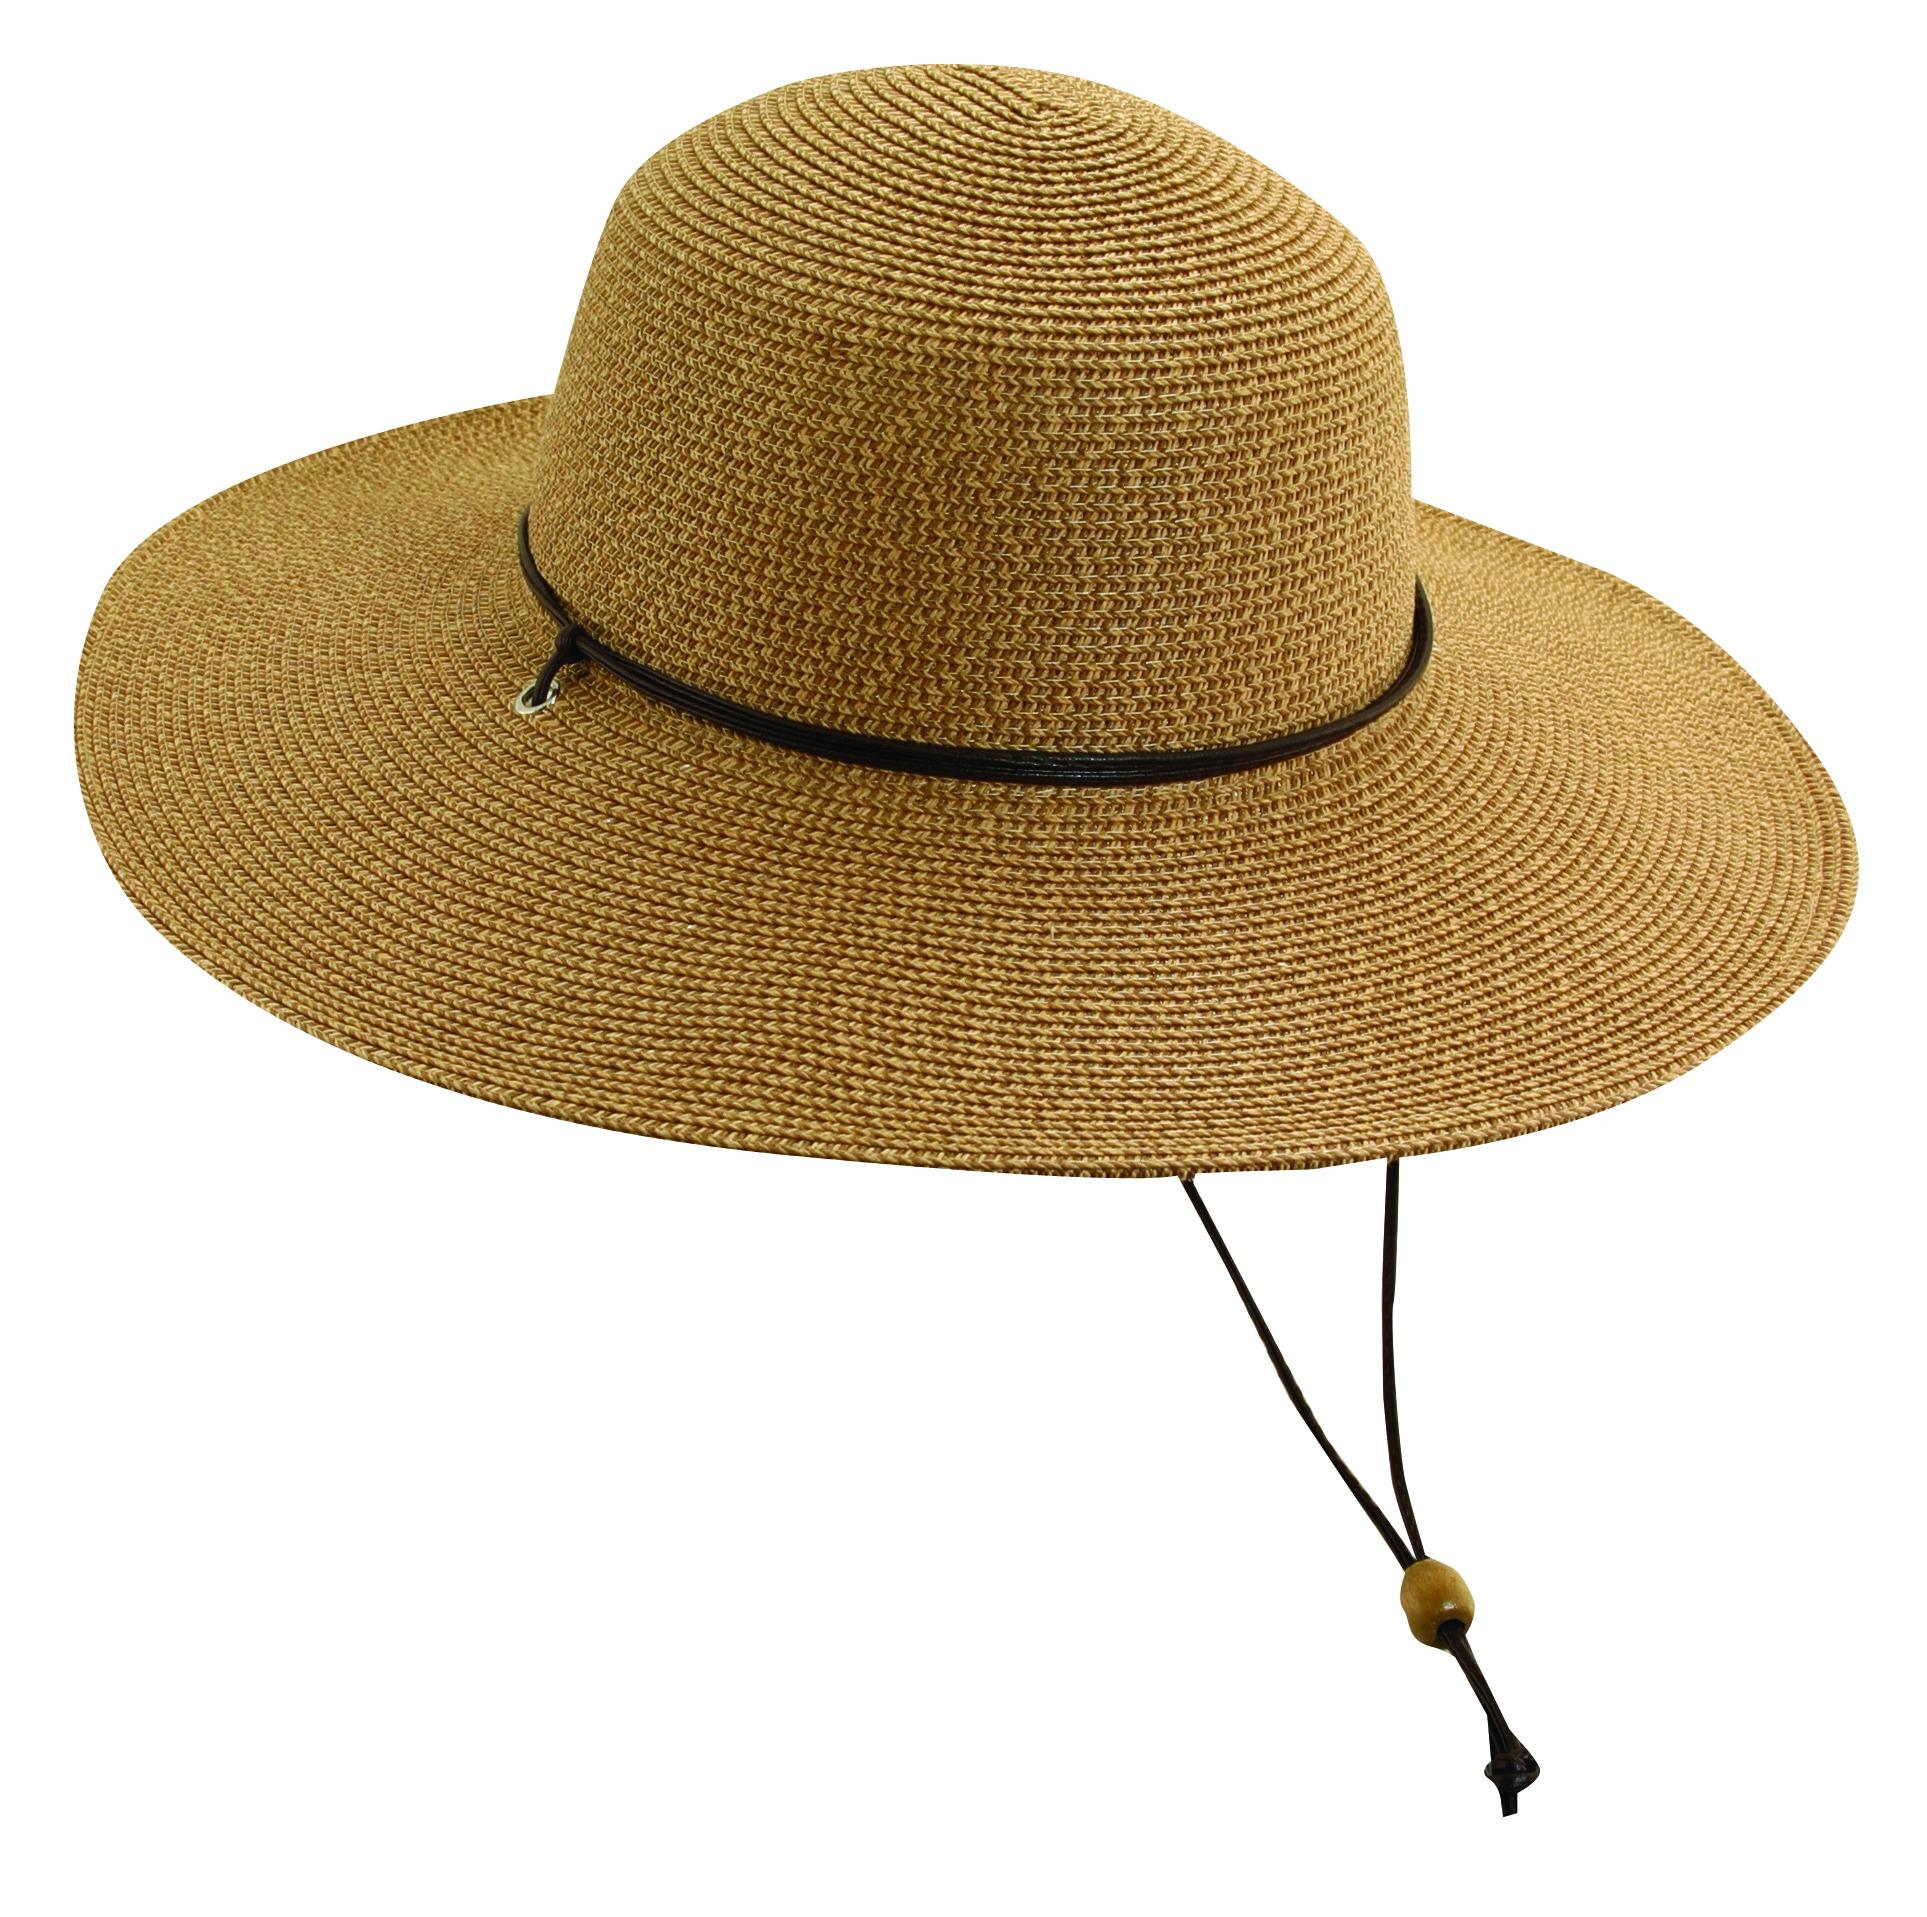 sun hats paper braid sun hat with chin cord coffee jkjbyen